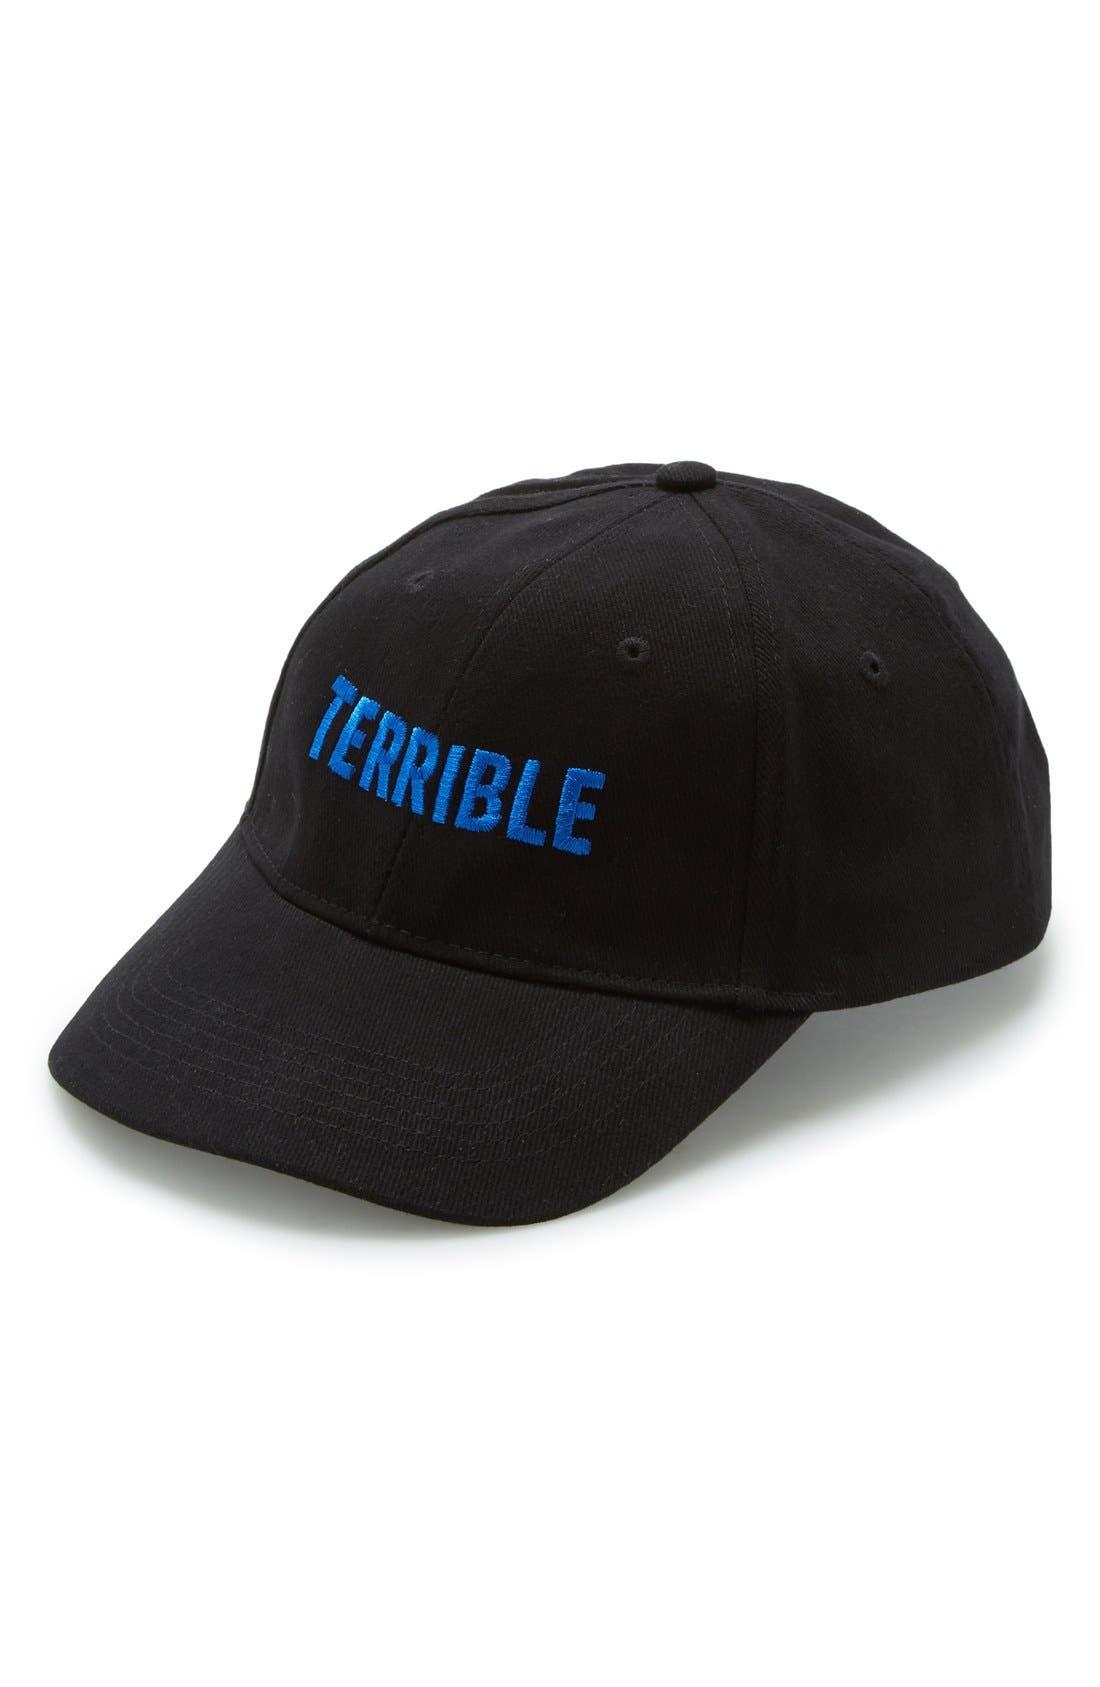 TERRIBLE RECORDS 'Terrible' Snapback Cap, Main, color, 400